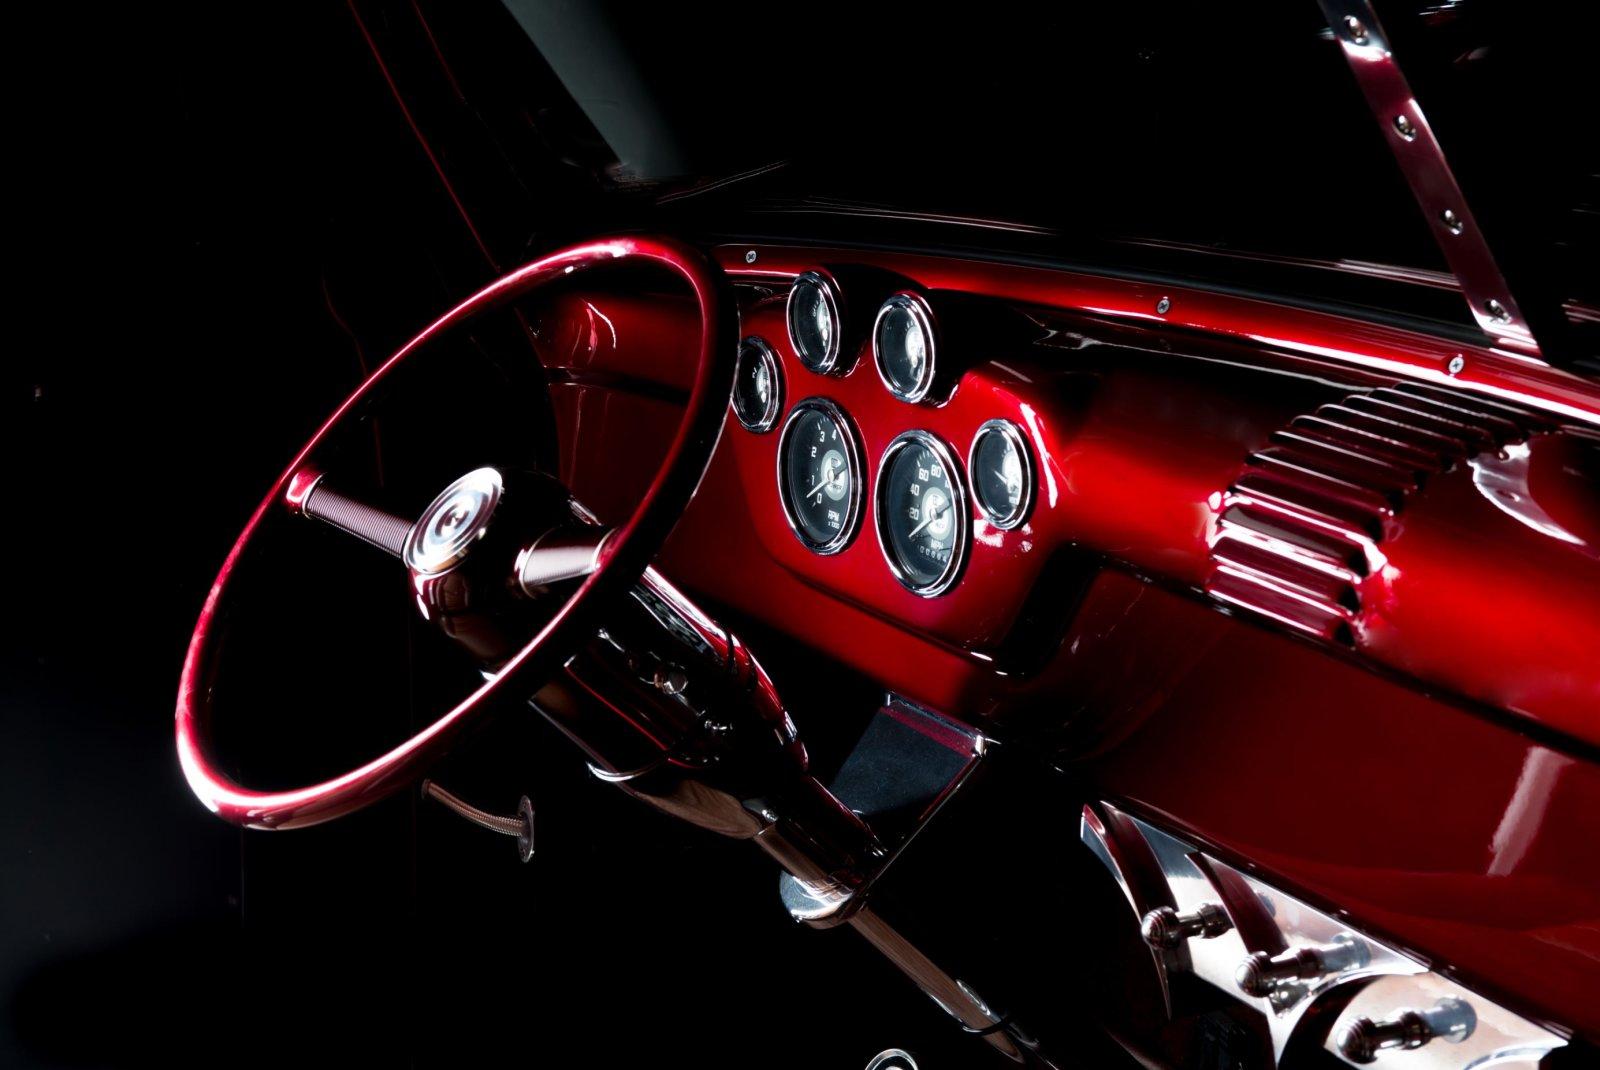 1955 Ford F-100 Story About Truck Owner Duke's Garage 3.JPG